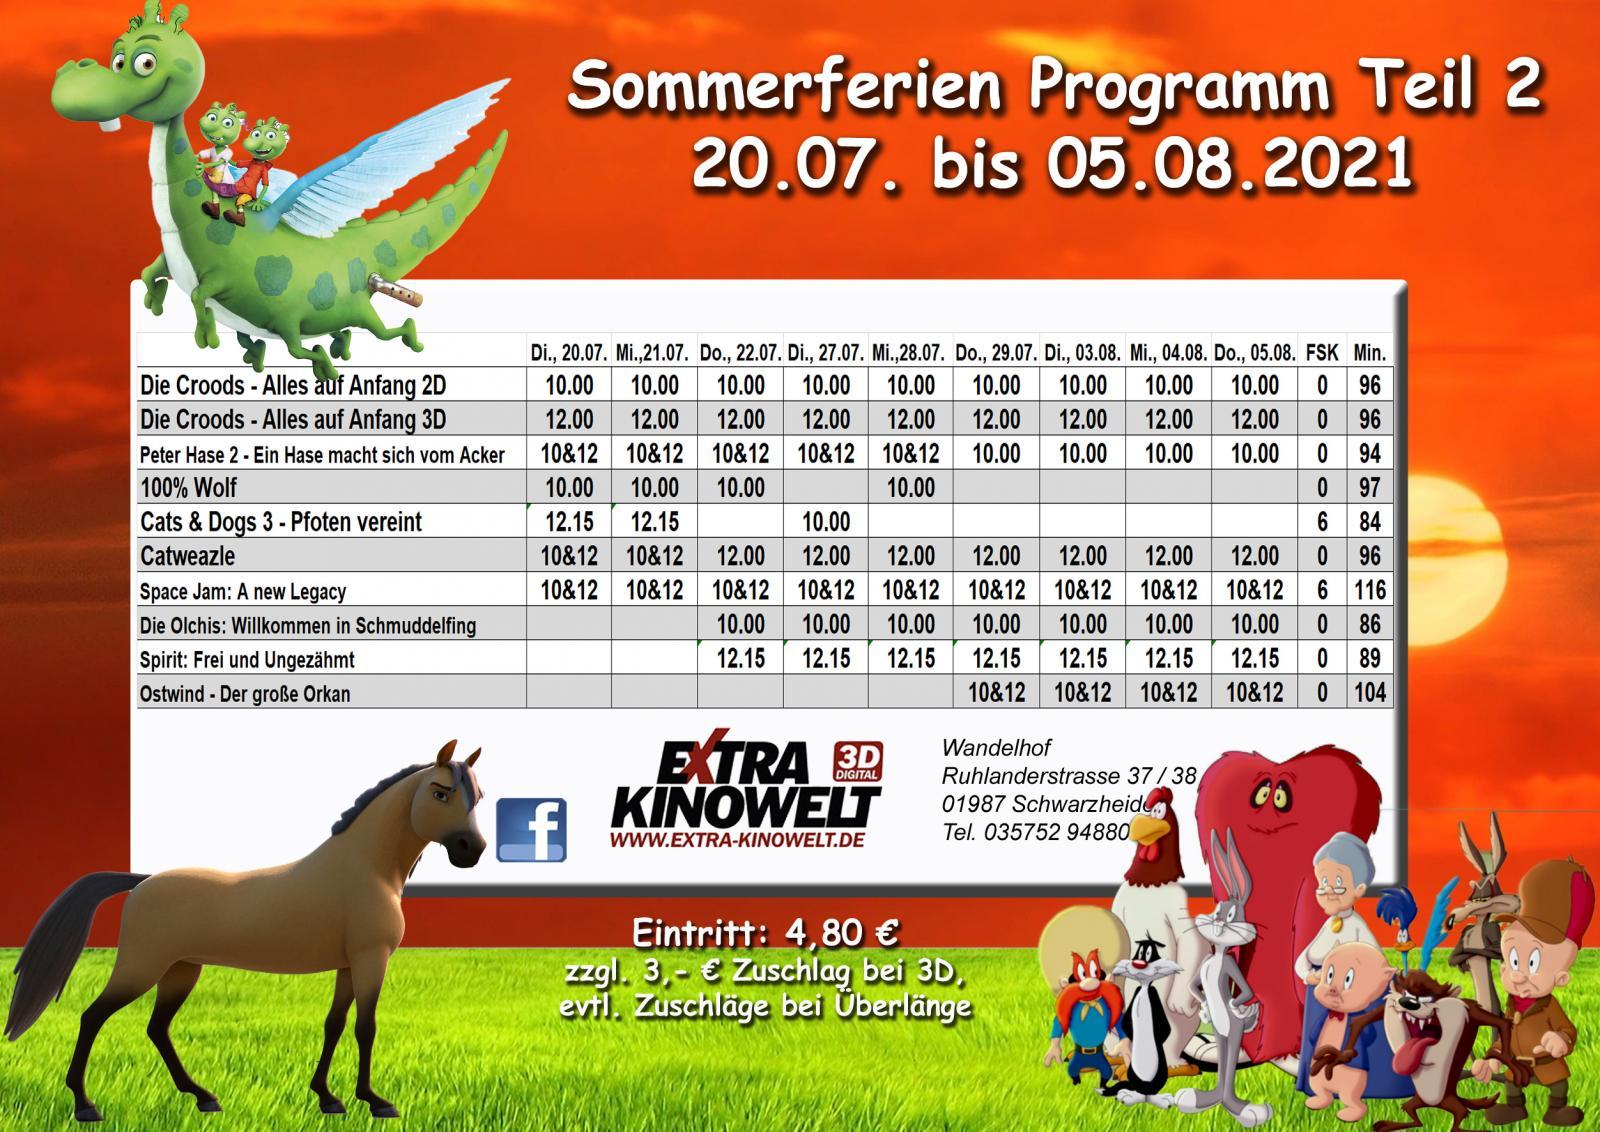 Sommerferienprogramm